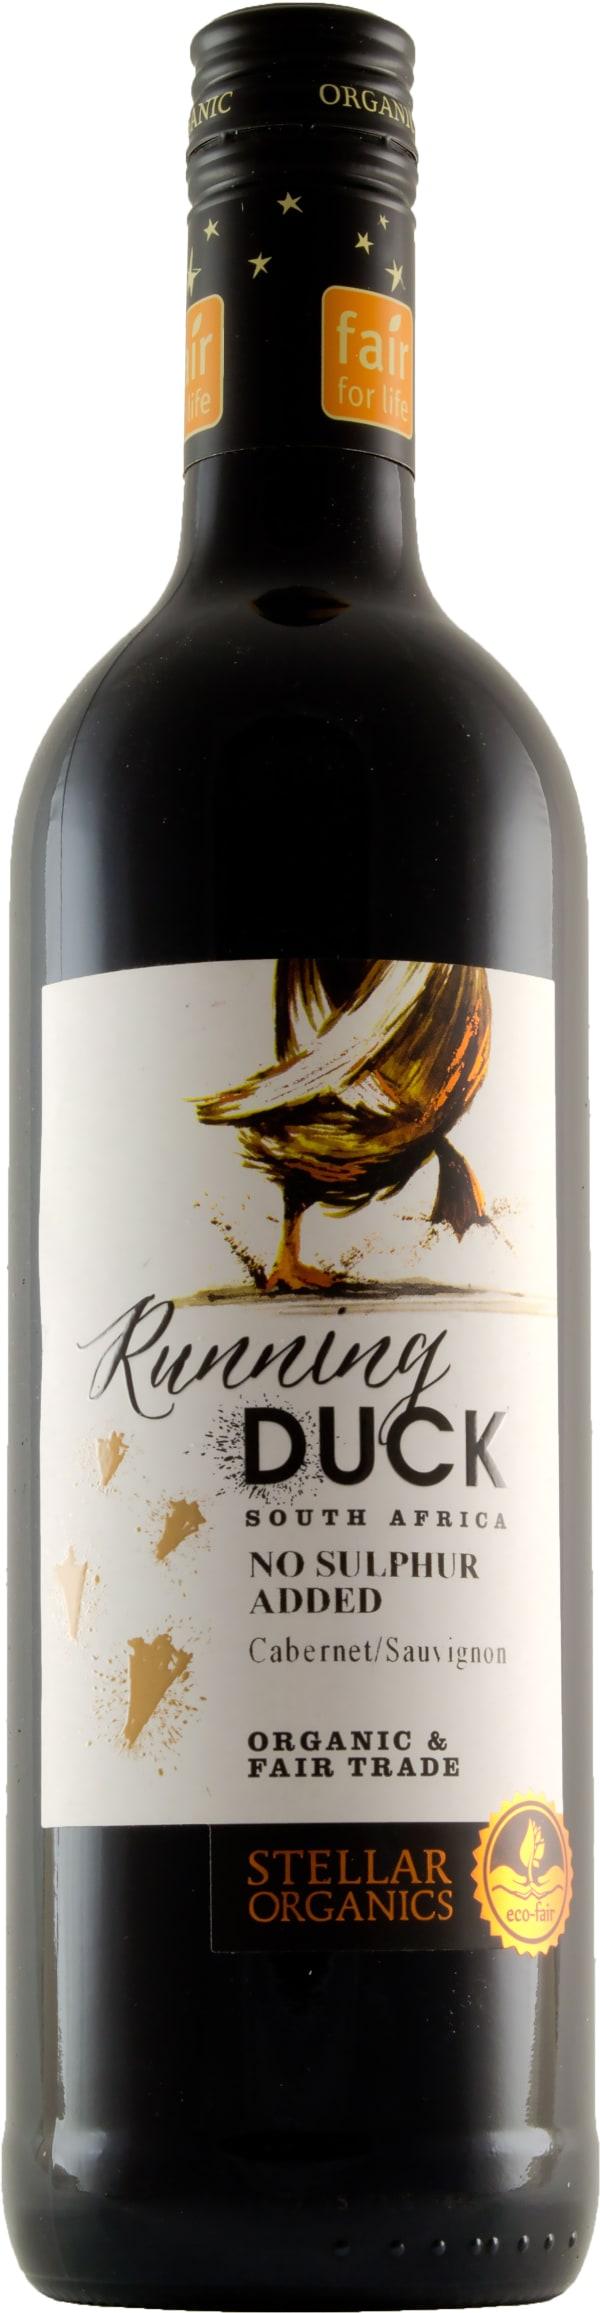 Running Duck Cabernet Sauvignon 2019